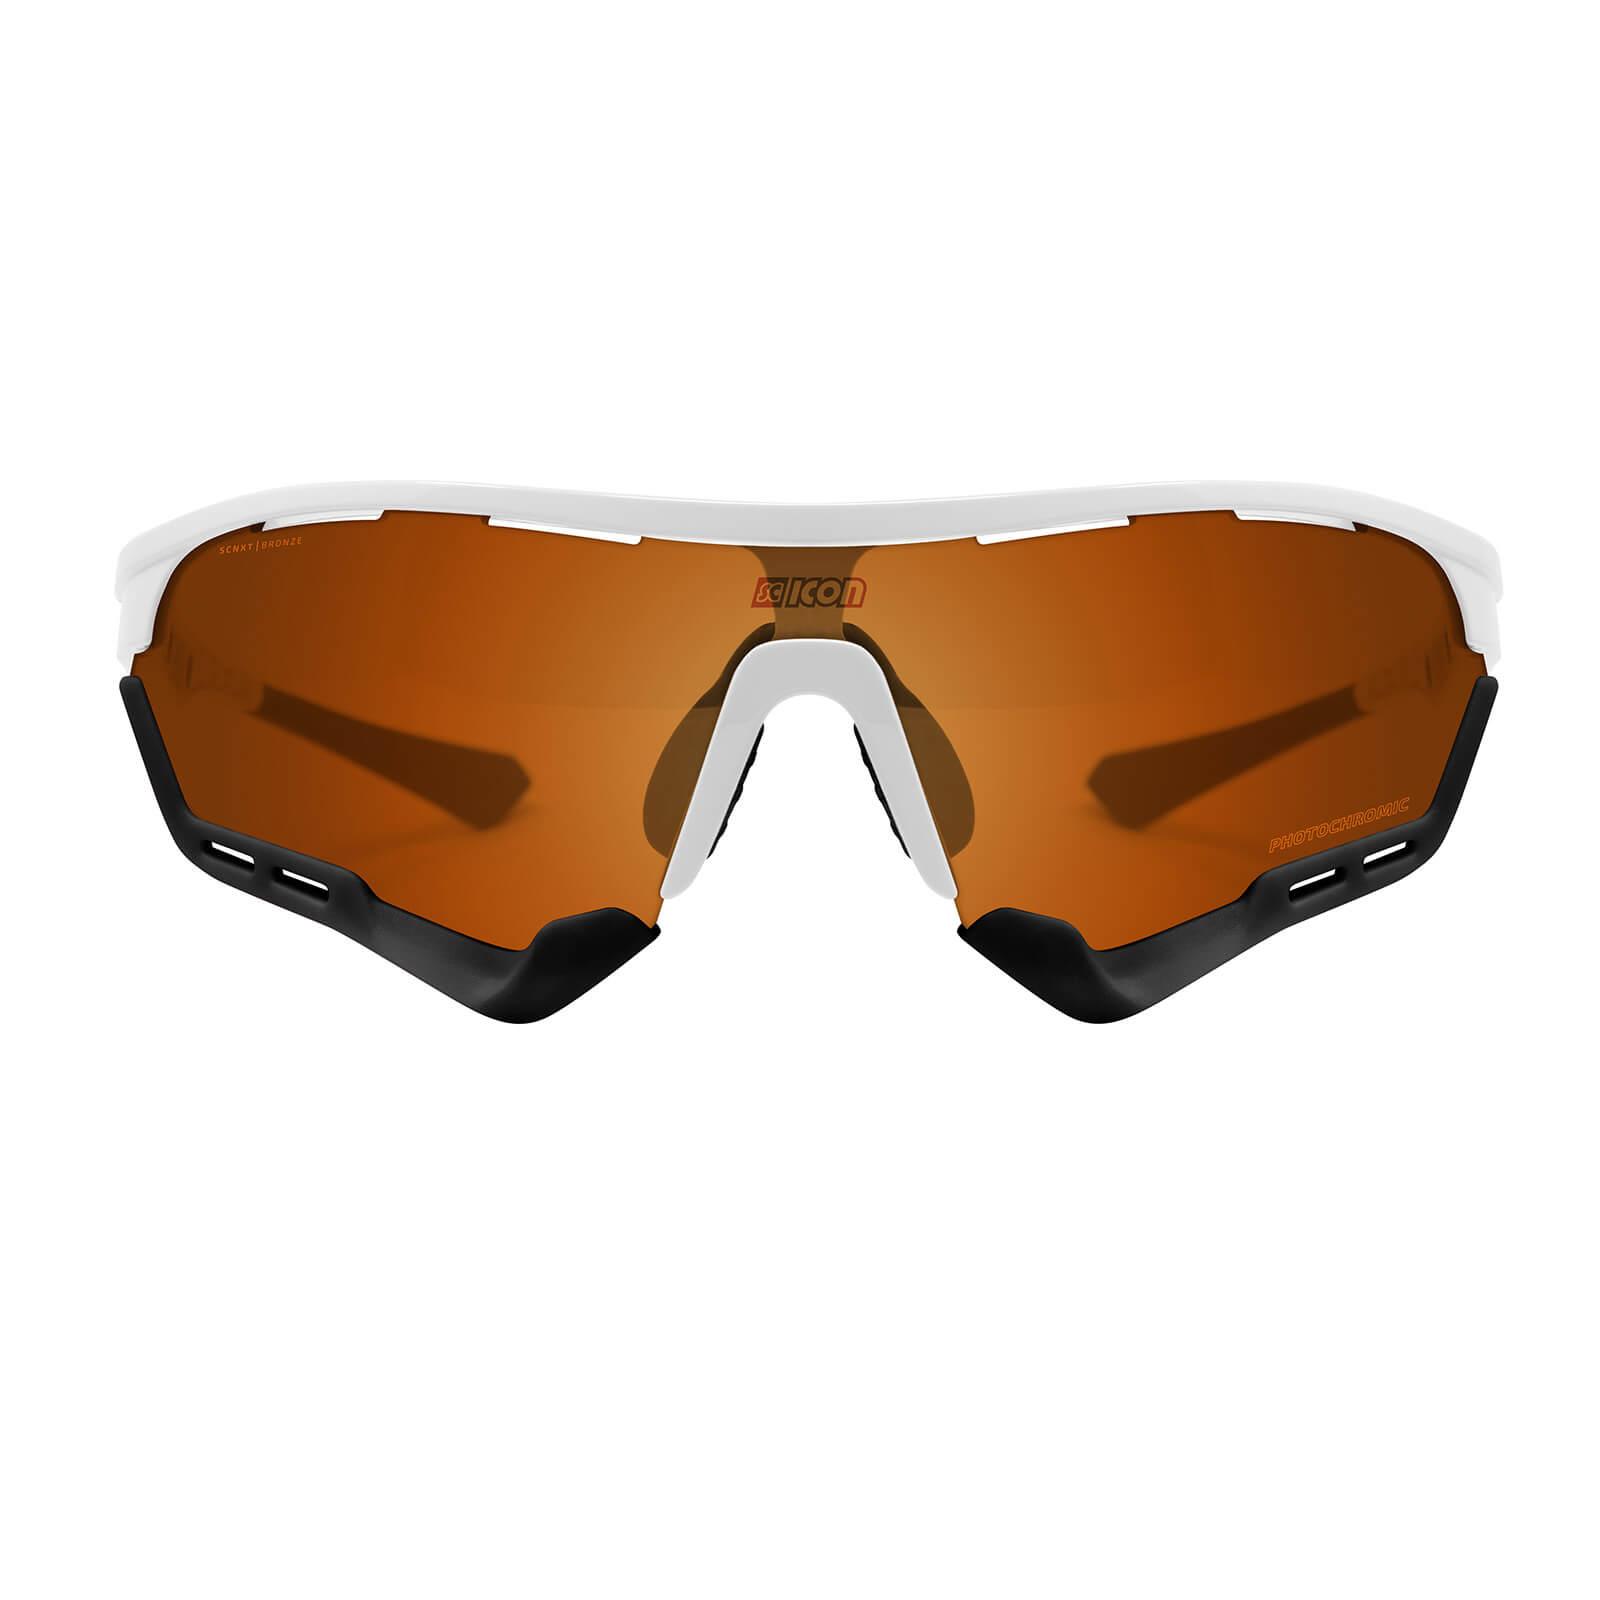 Scicon Aerotech Sunglasses SCN-XT Photochromic Bronze Mirror Lens - White Gloss Frame - XL Lens